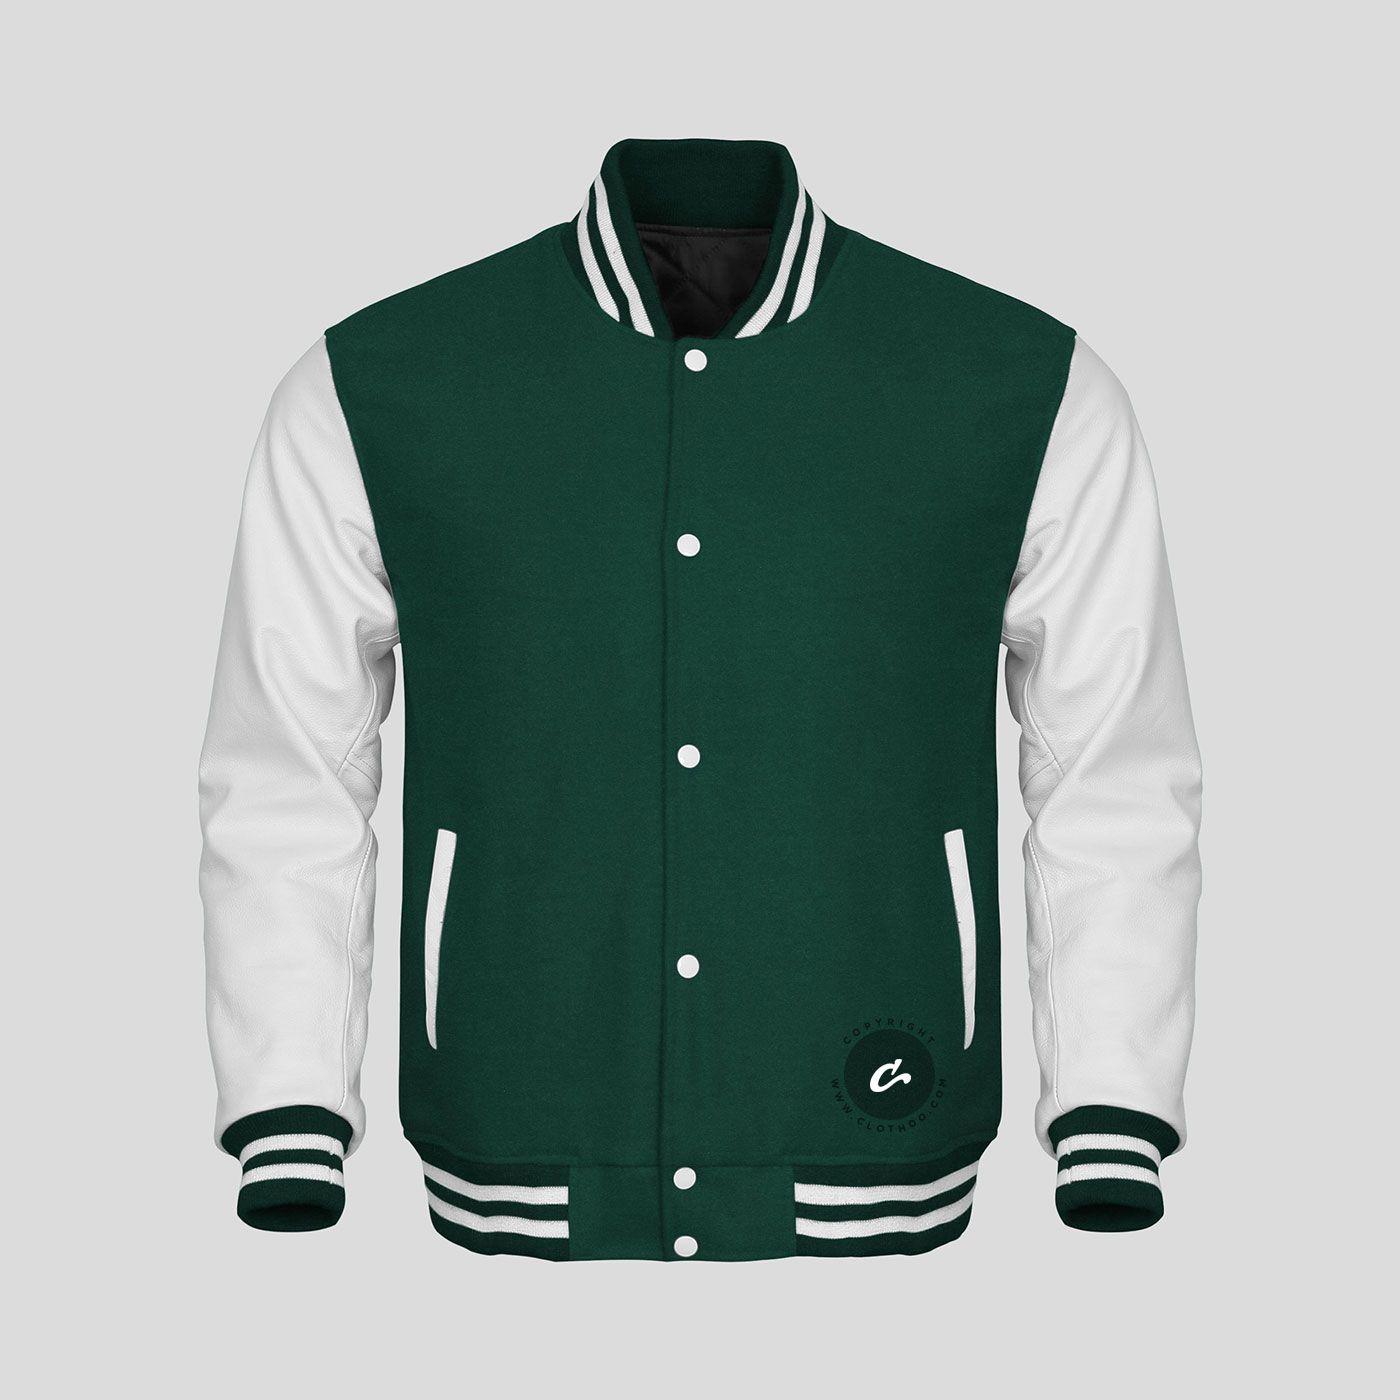 Design your own varsity jacket, customize Letterman jacket